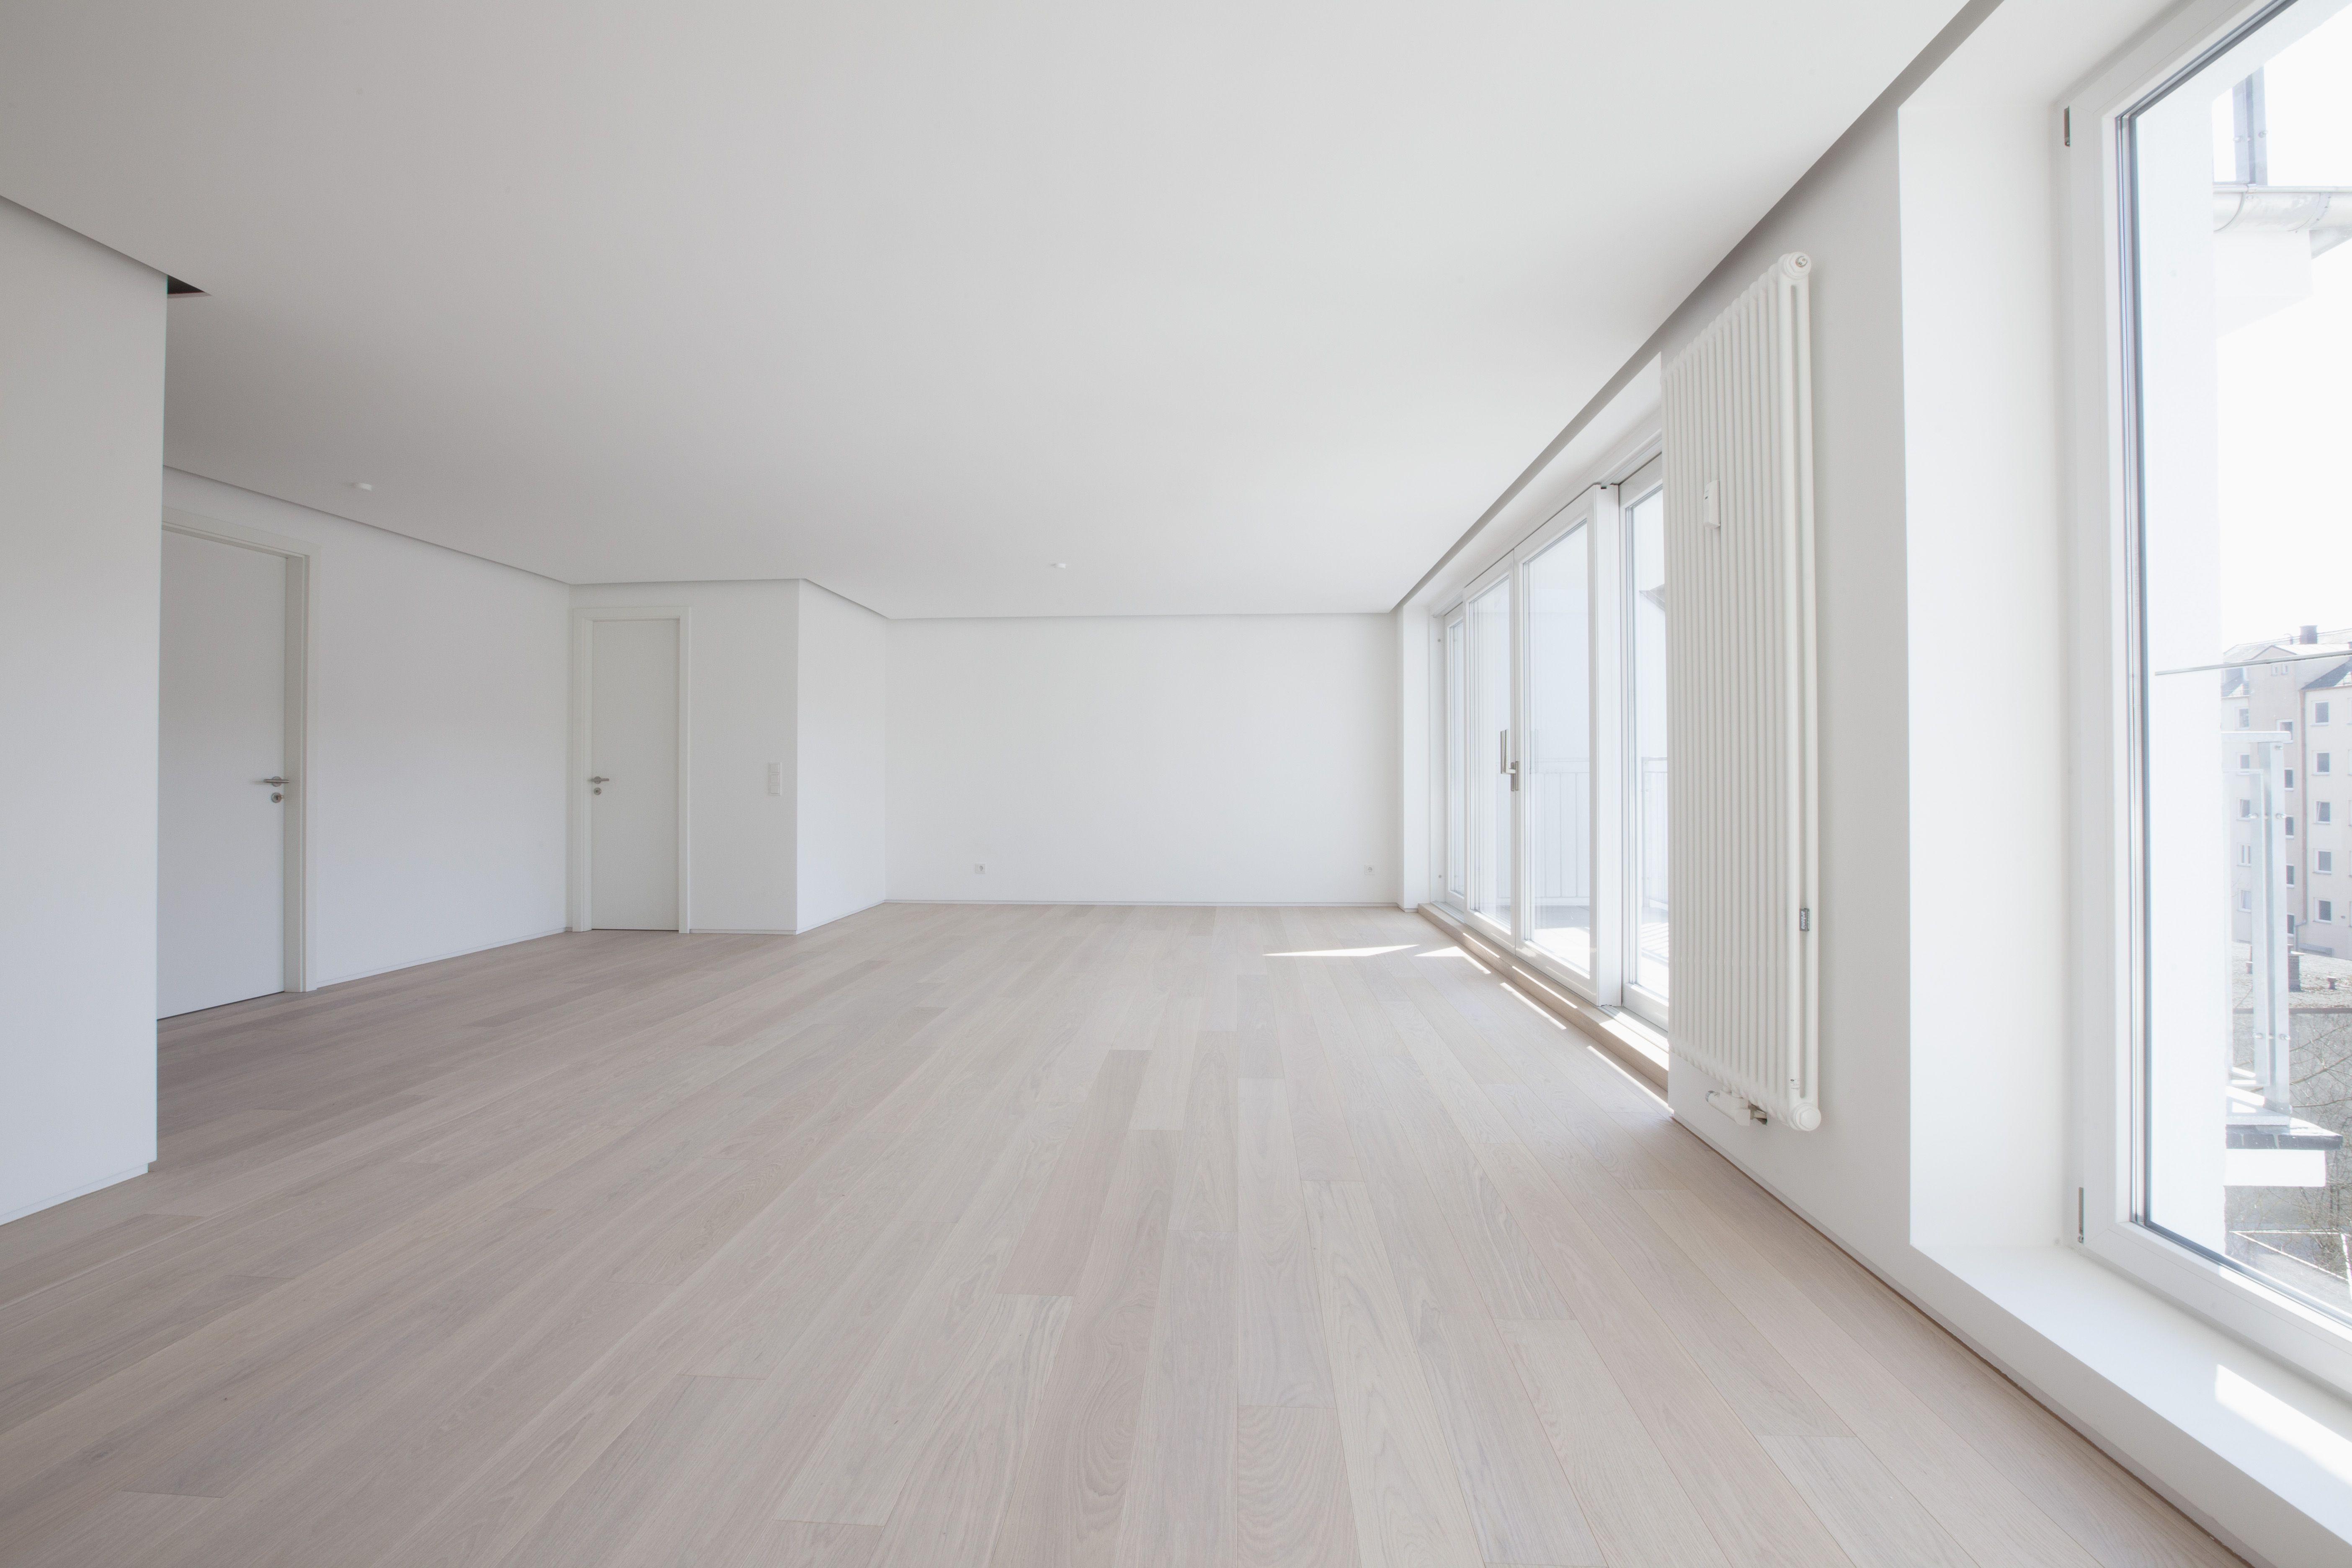 3 8 inch engineered hardwood flooring of basics of favorite hybrid engineered wood floors within empty living room in modern apartment 578189139 58866f903df78c2ccdecab05